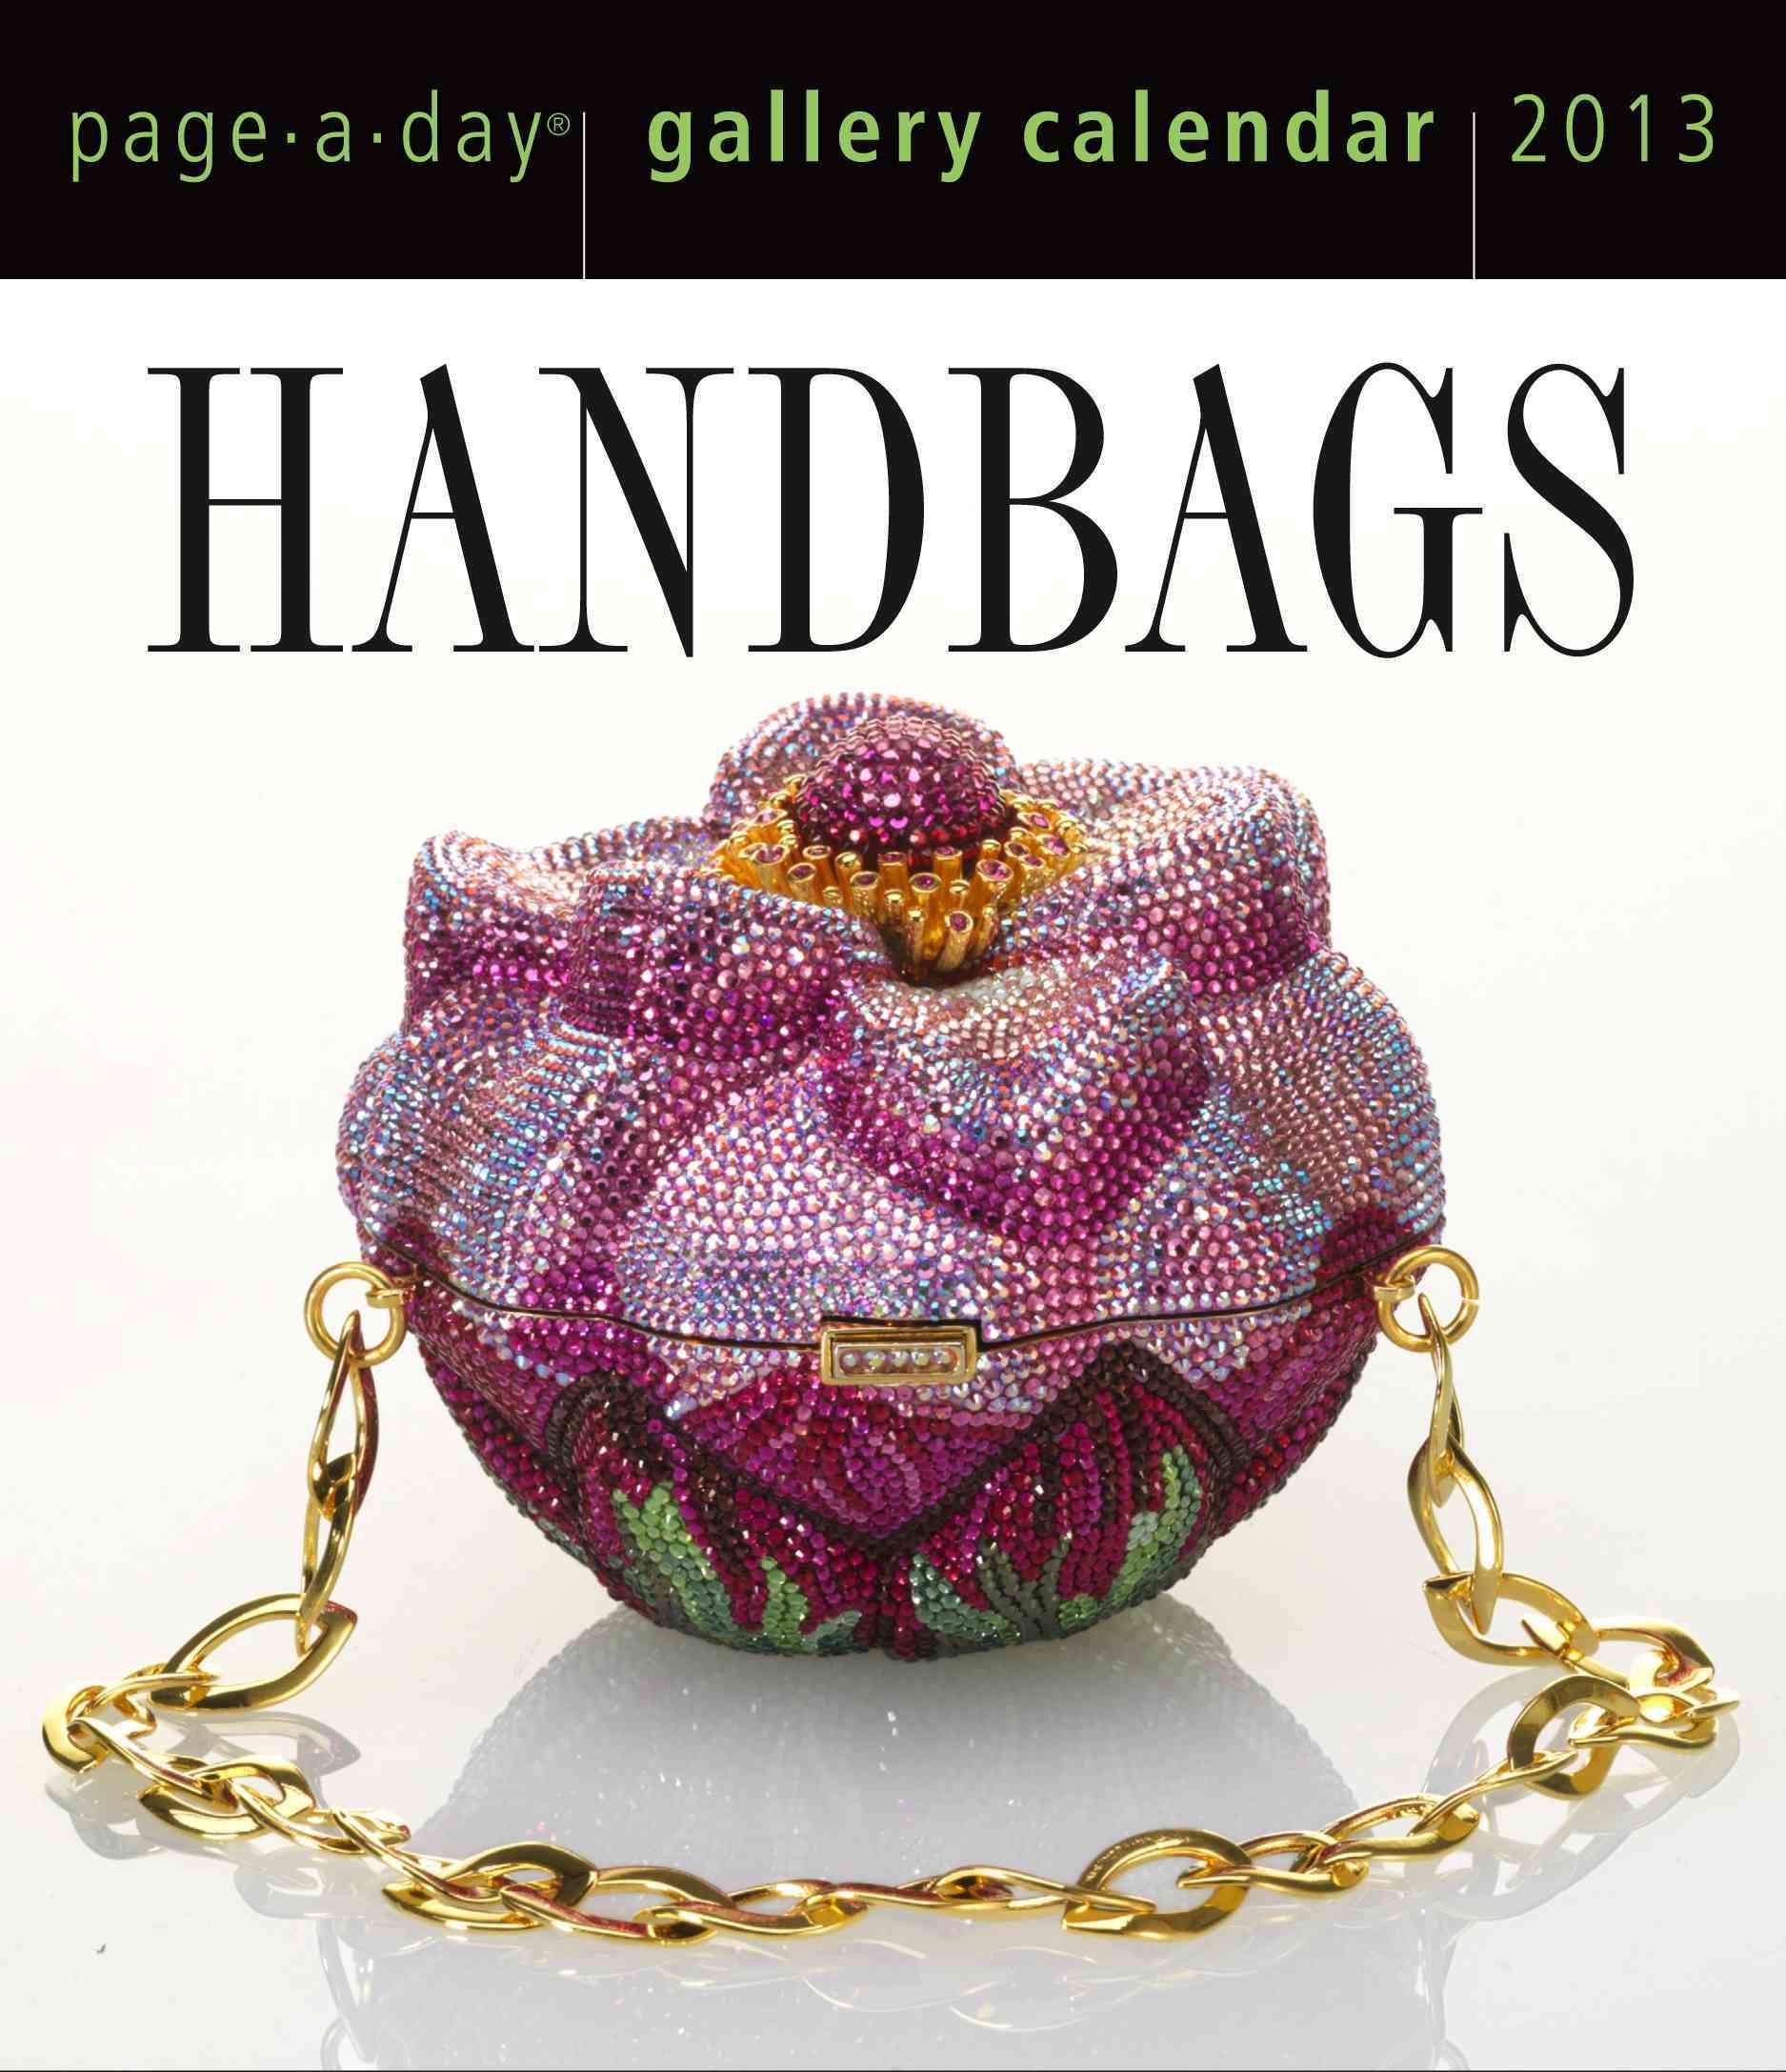 Handbags Gallery 2013 Calendar